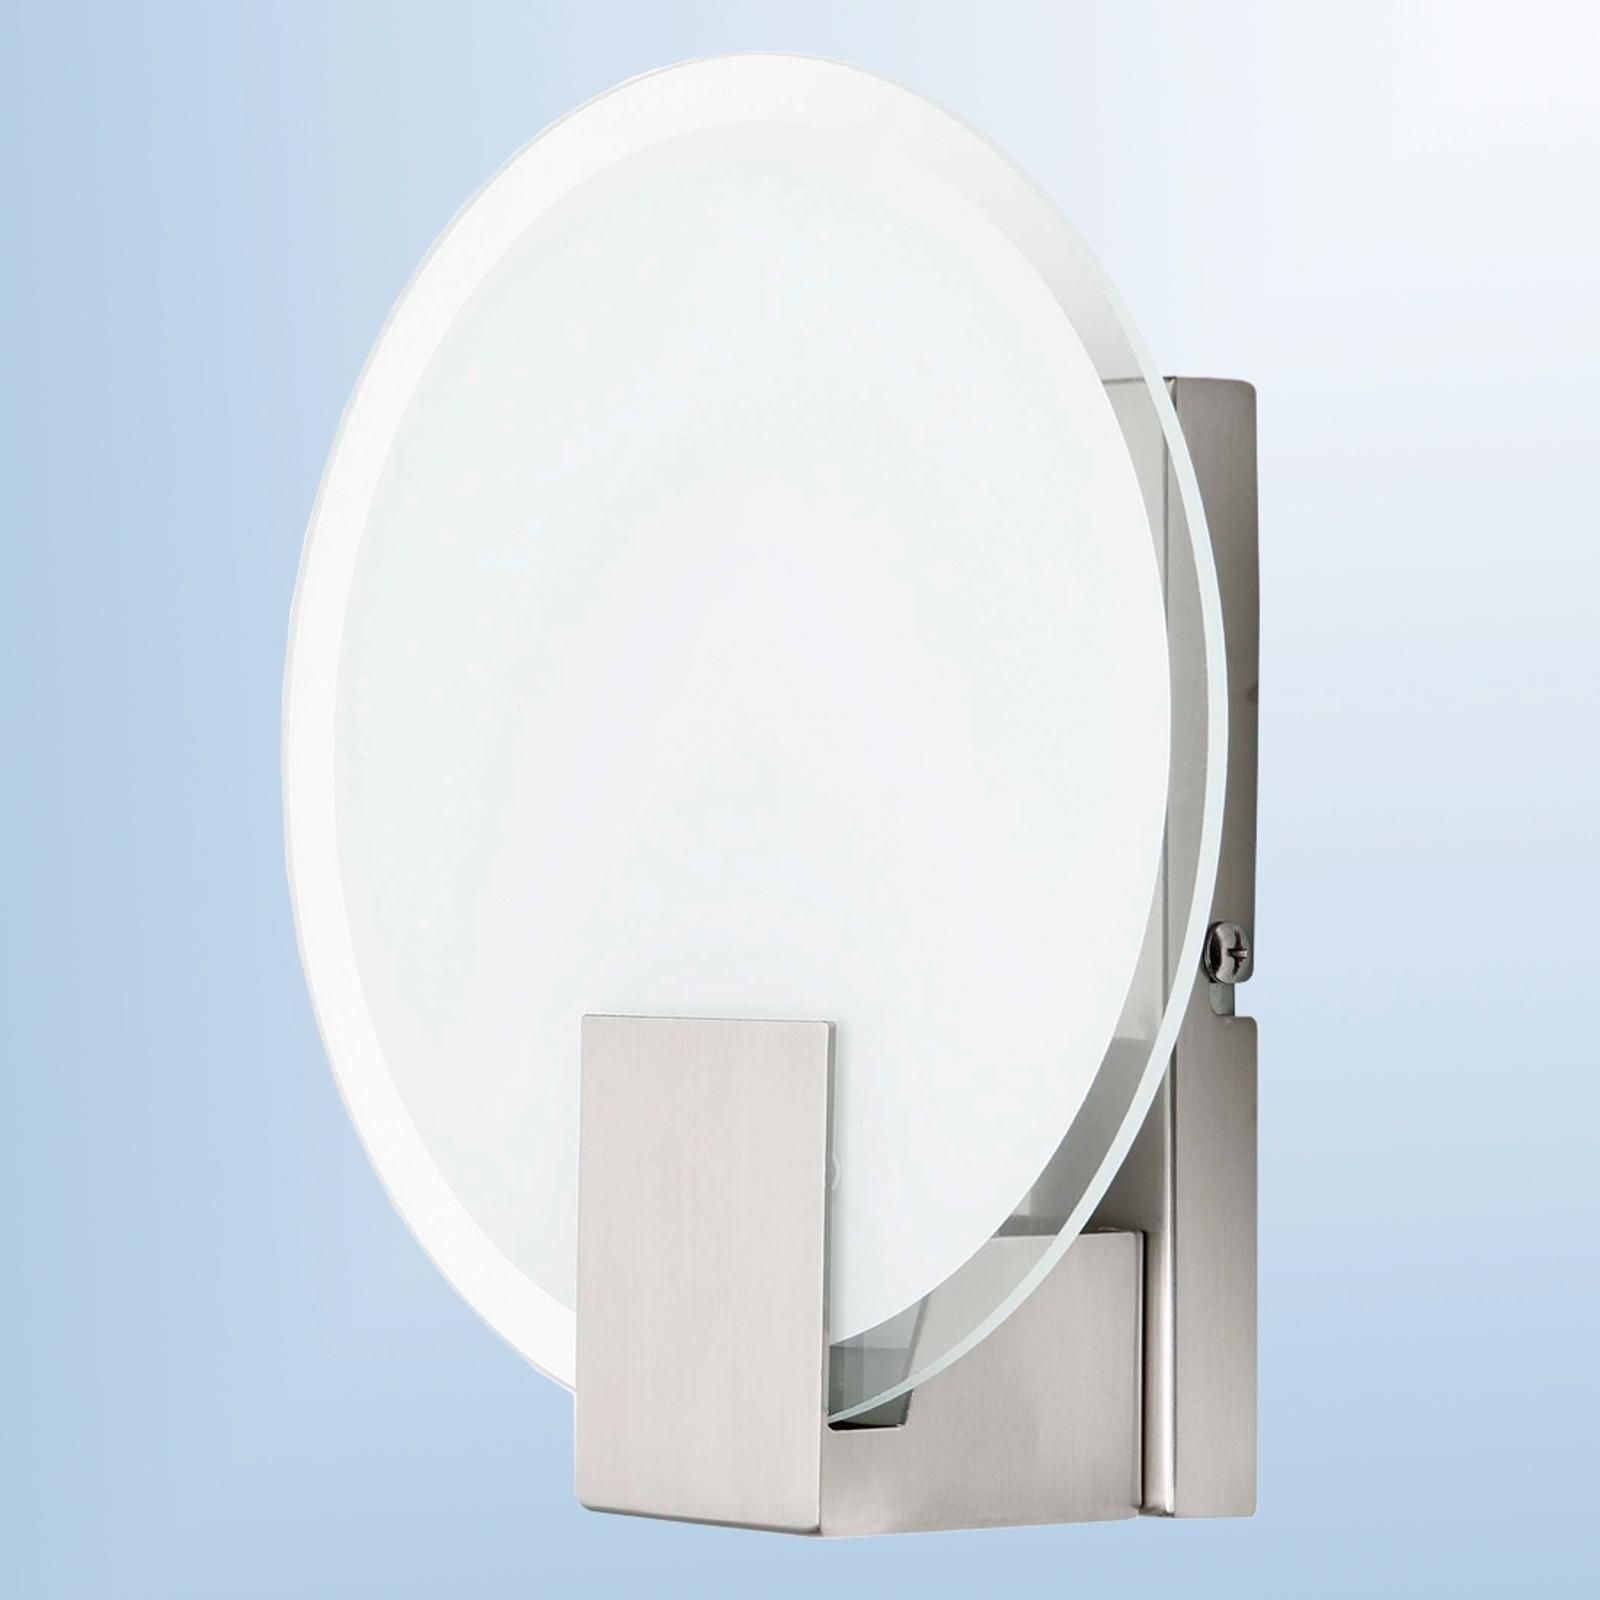 Stijlvolle ronde wandlamp Sonian